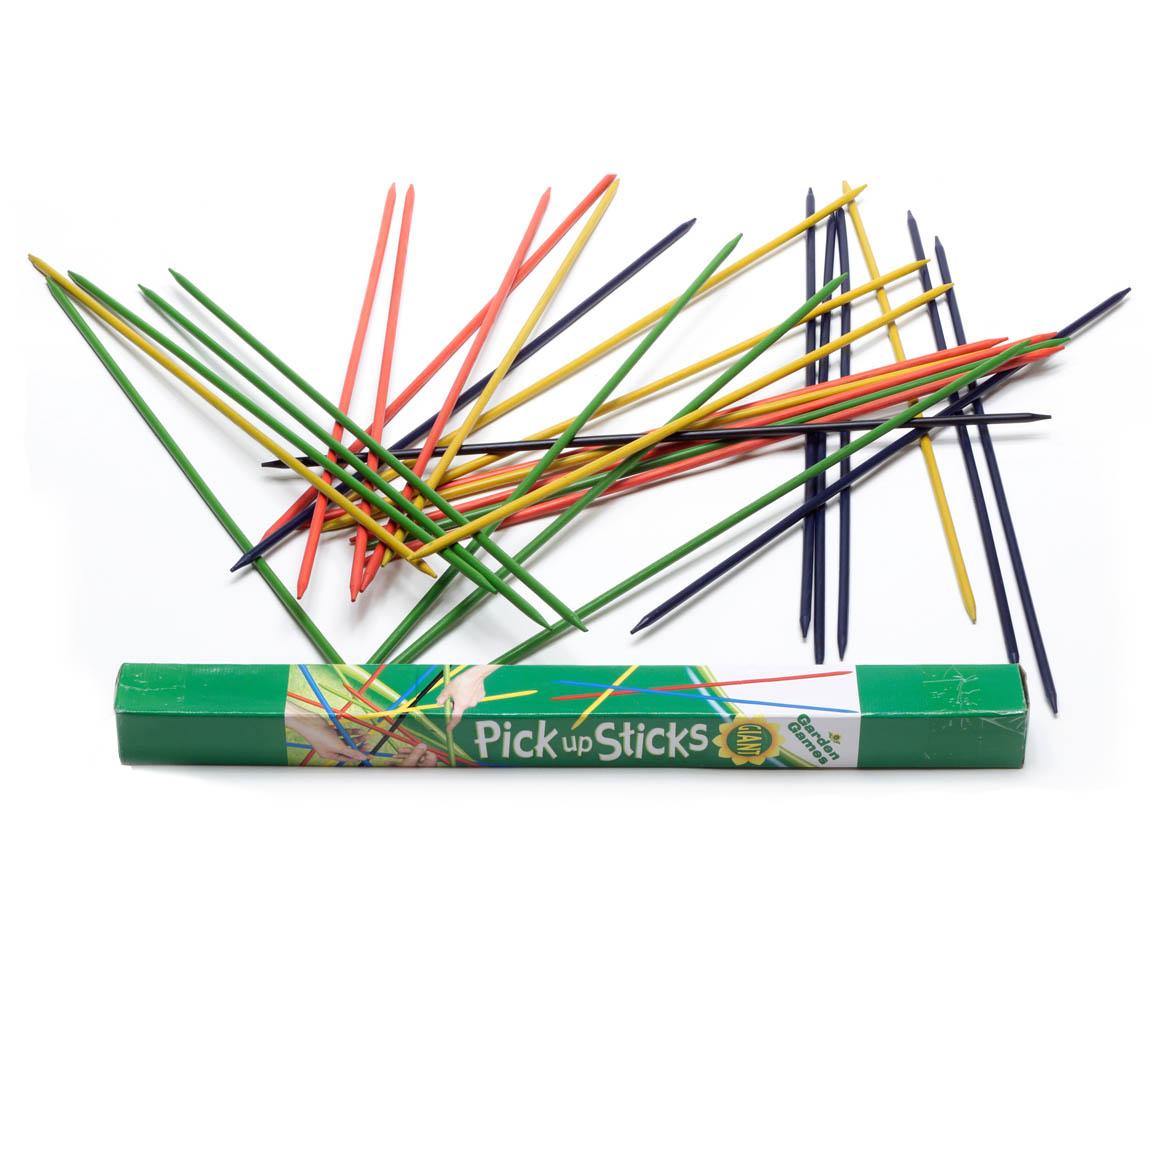 Image of Garden Games Giant Pick Up Sticks